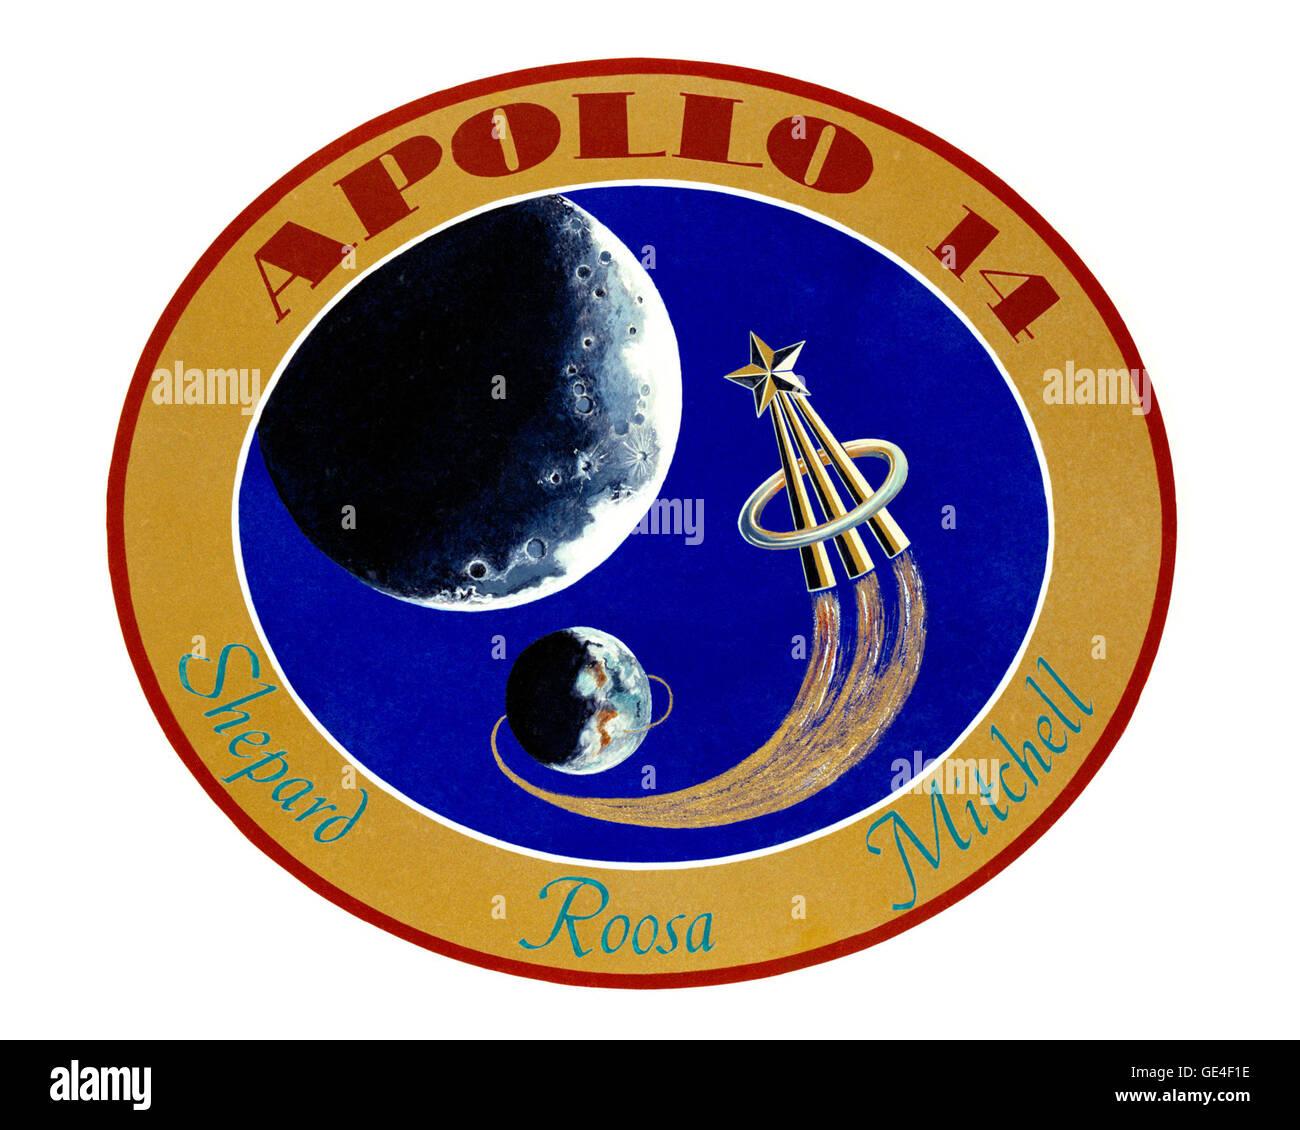 Launch- January 31, 1971  Landing- February 9, 1971 Astronauts- Alan B. Shepard Jr., Edgar D. Mitchell and Stuart - Stock Image